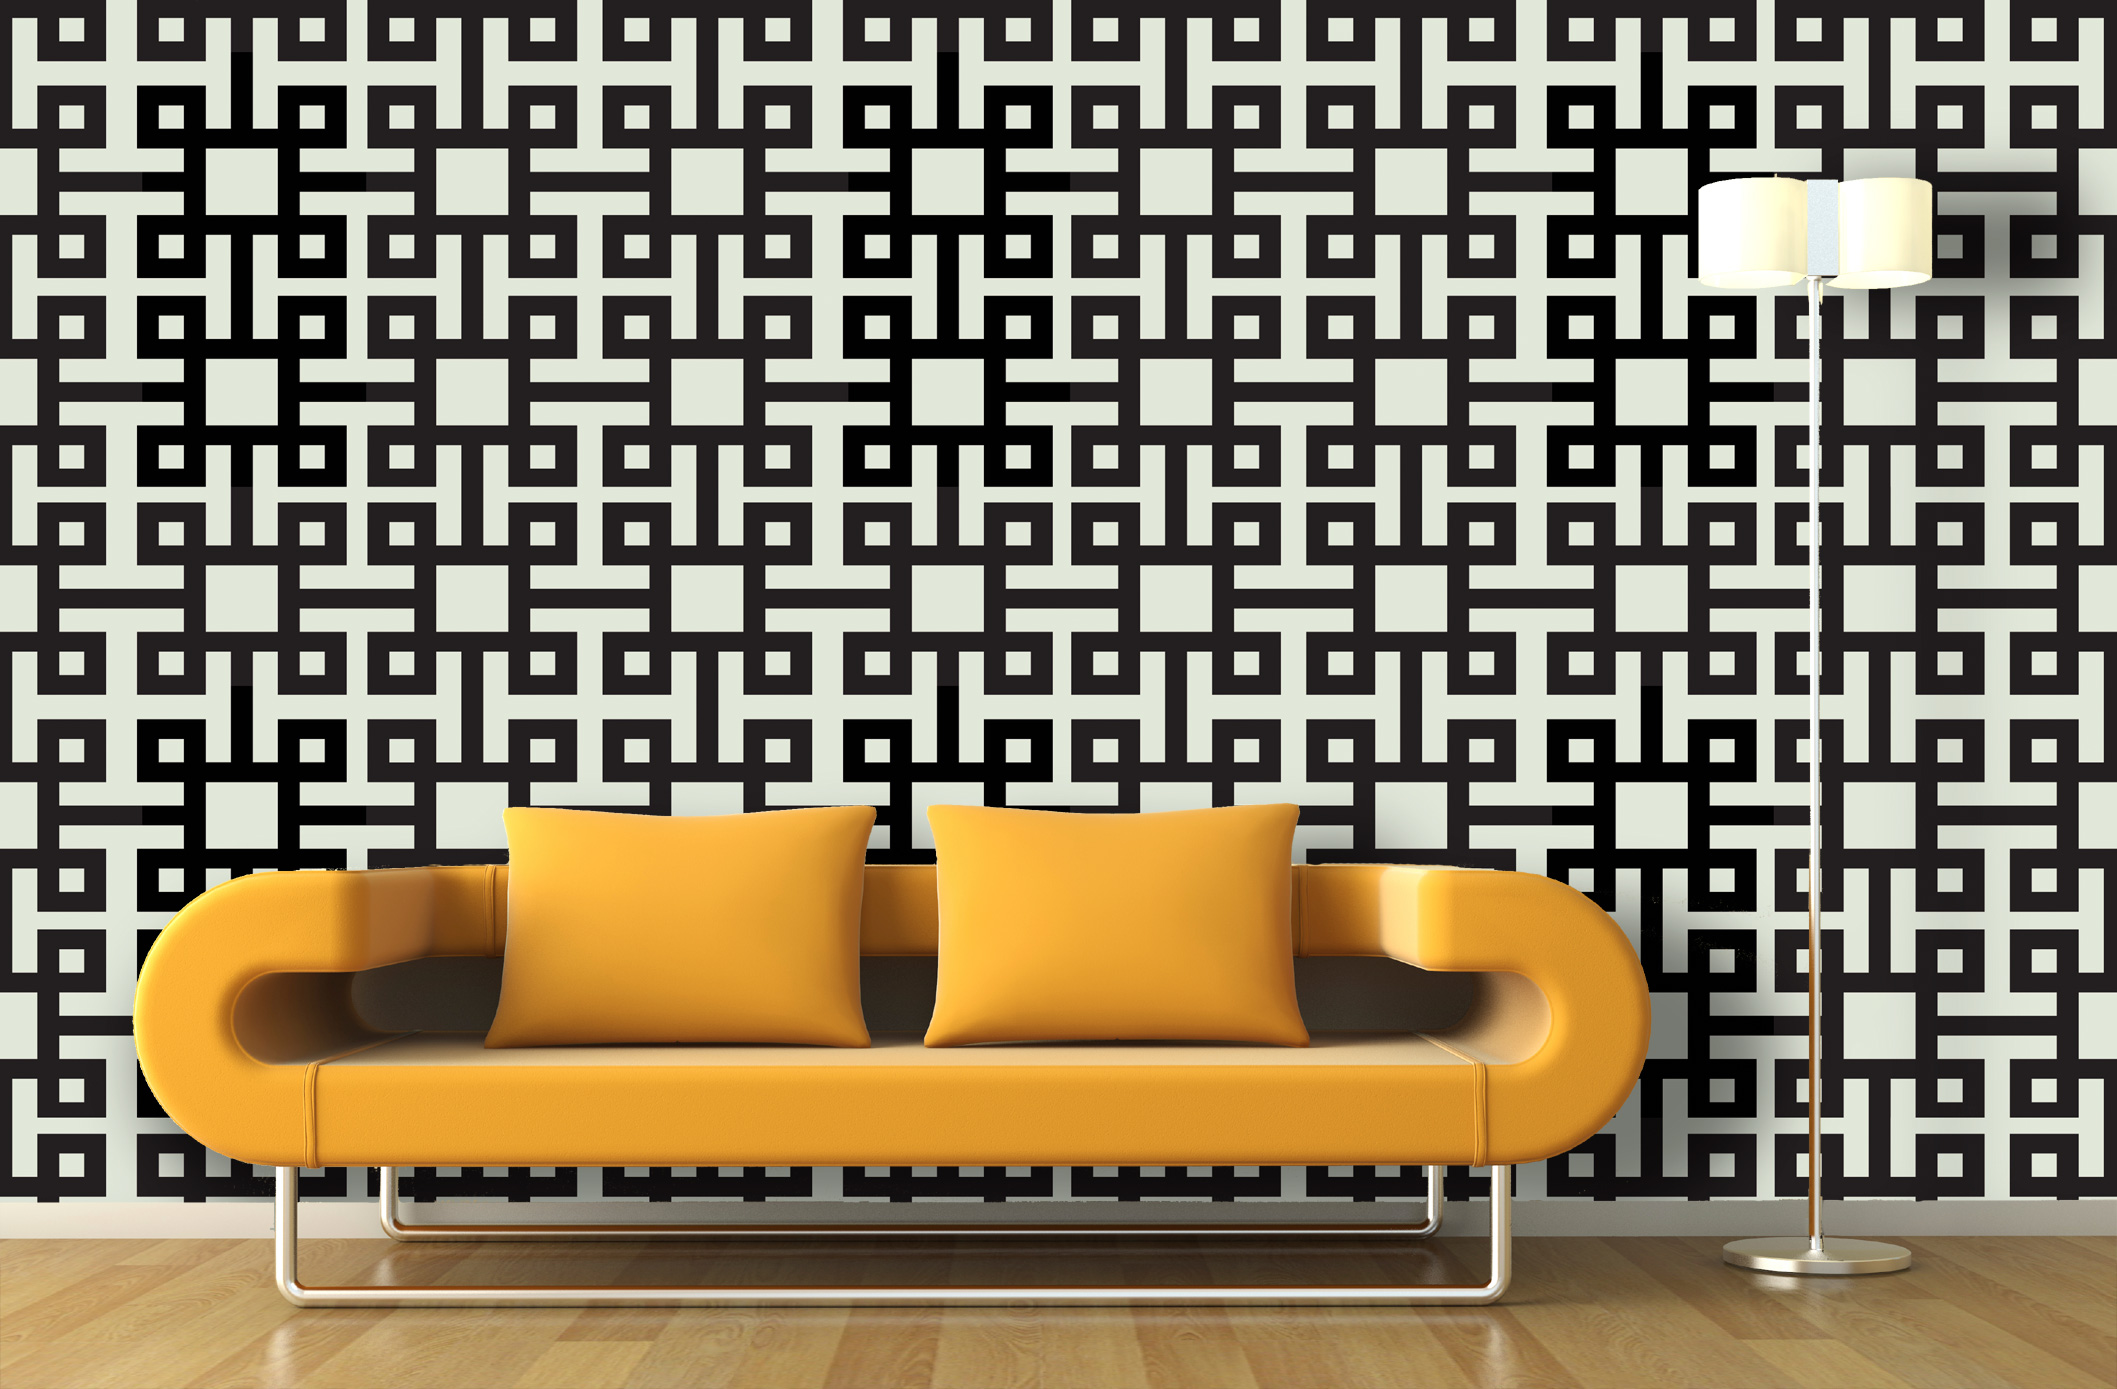 Modern-Gold-Sofa-PLATO-charcoal.jpg